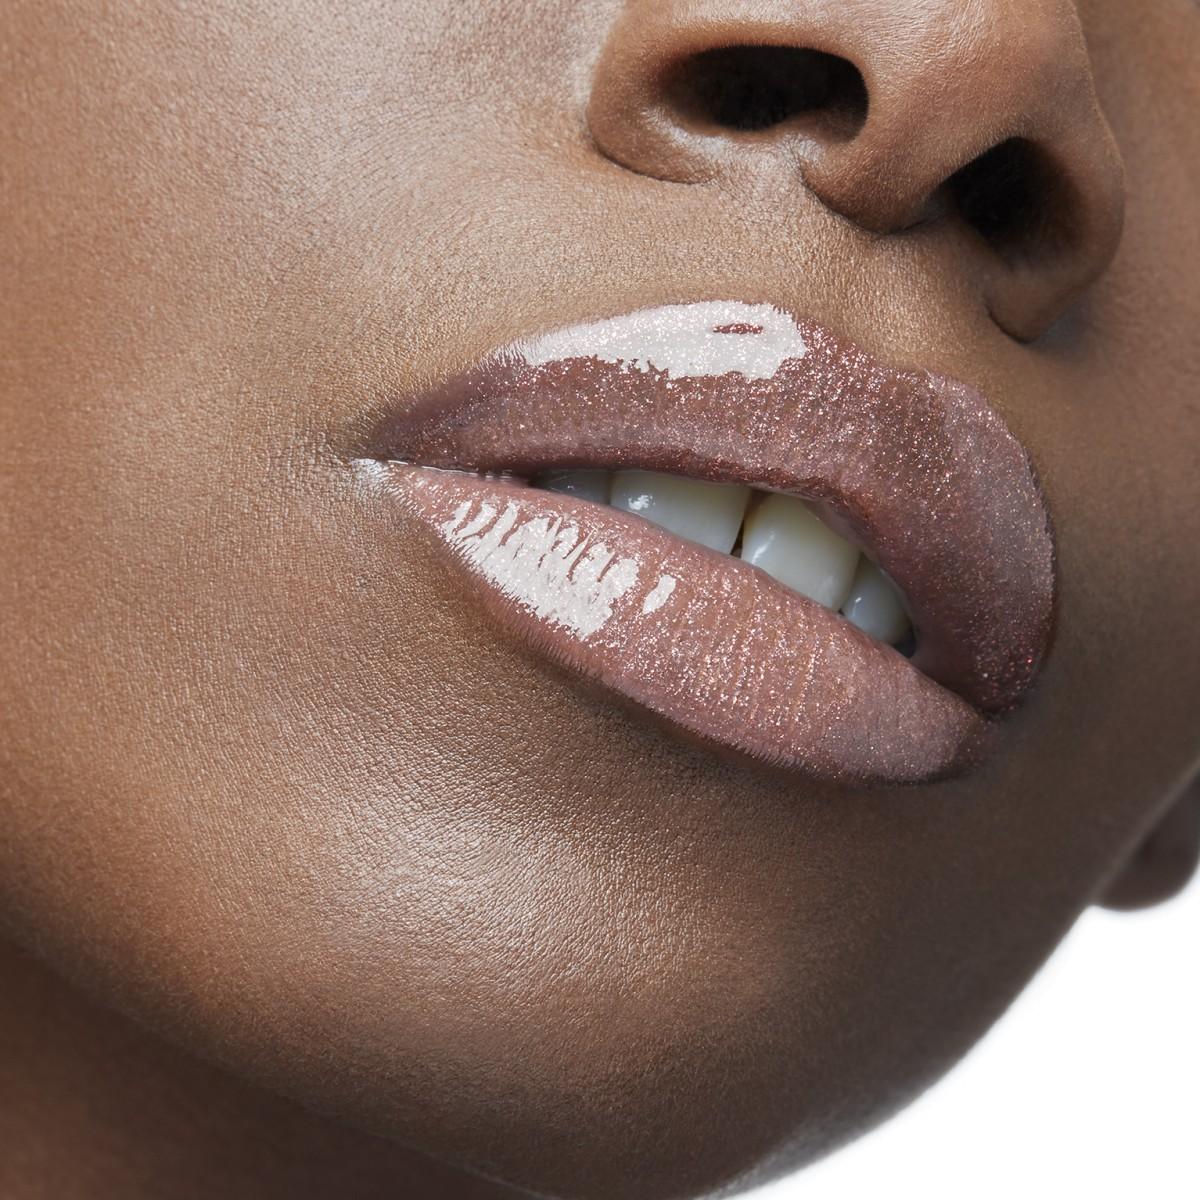 Beauty - Doracandy Loubilaque Lip Gloss - Christian Louboutin